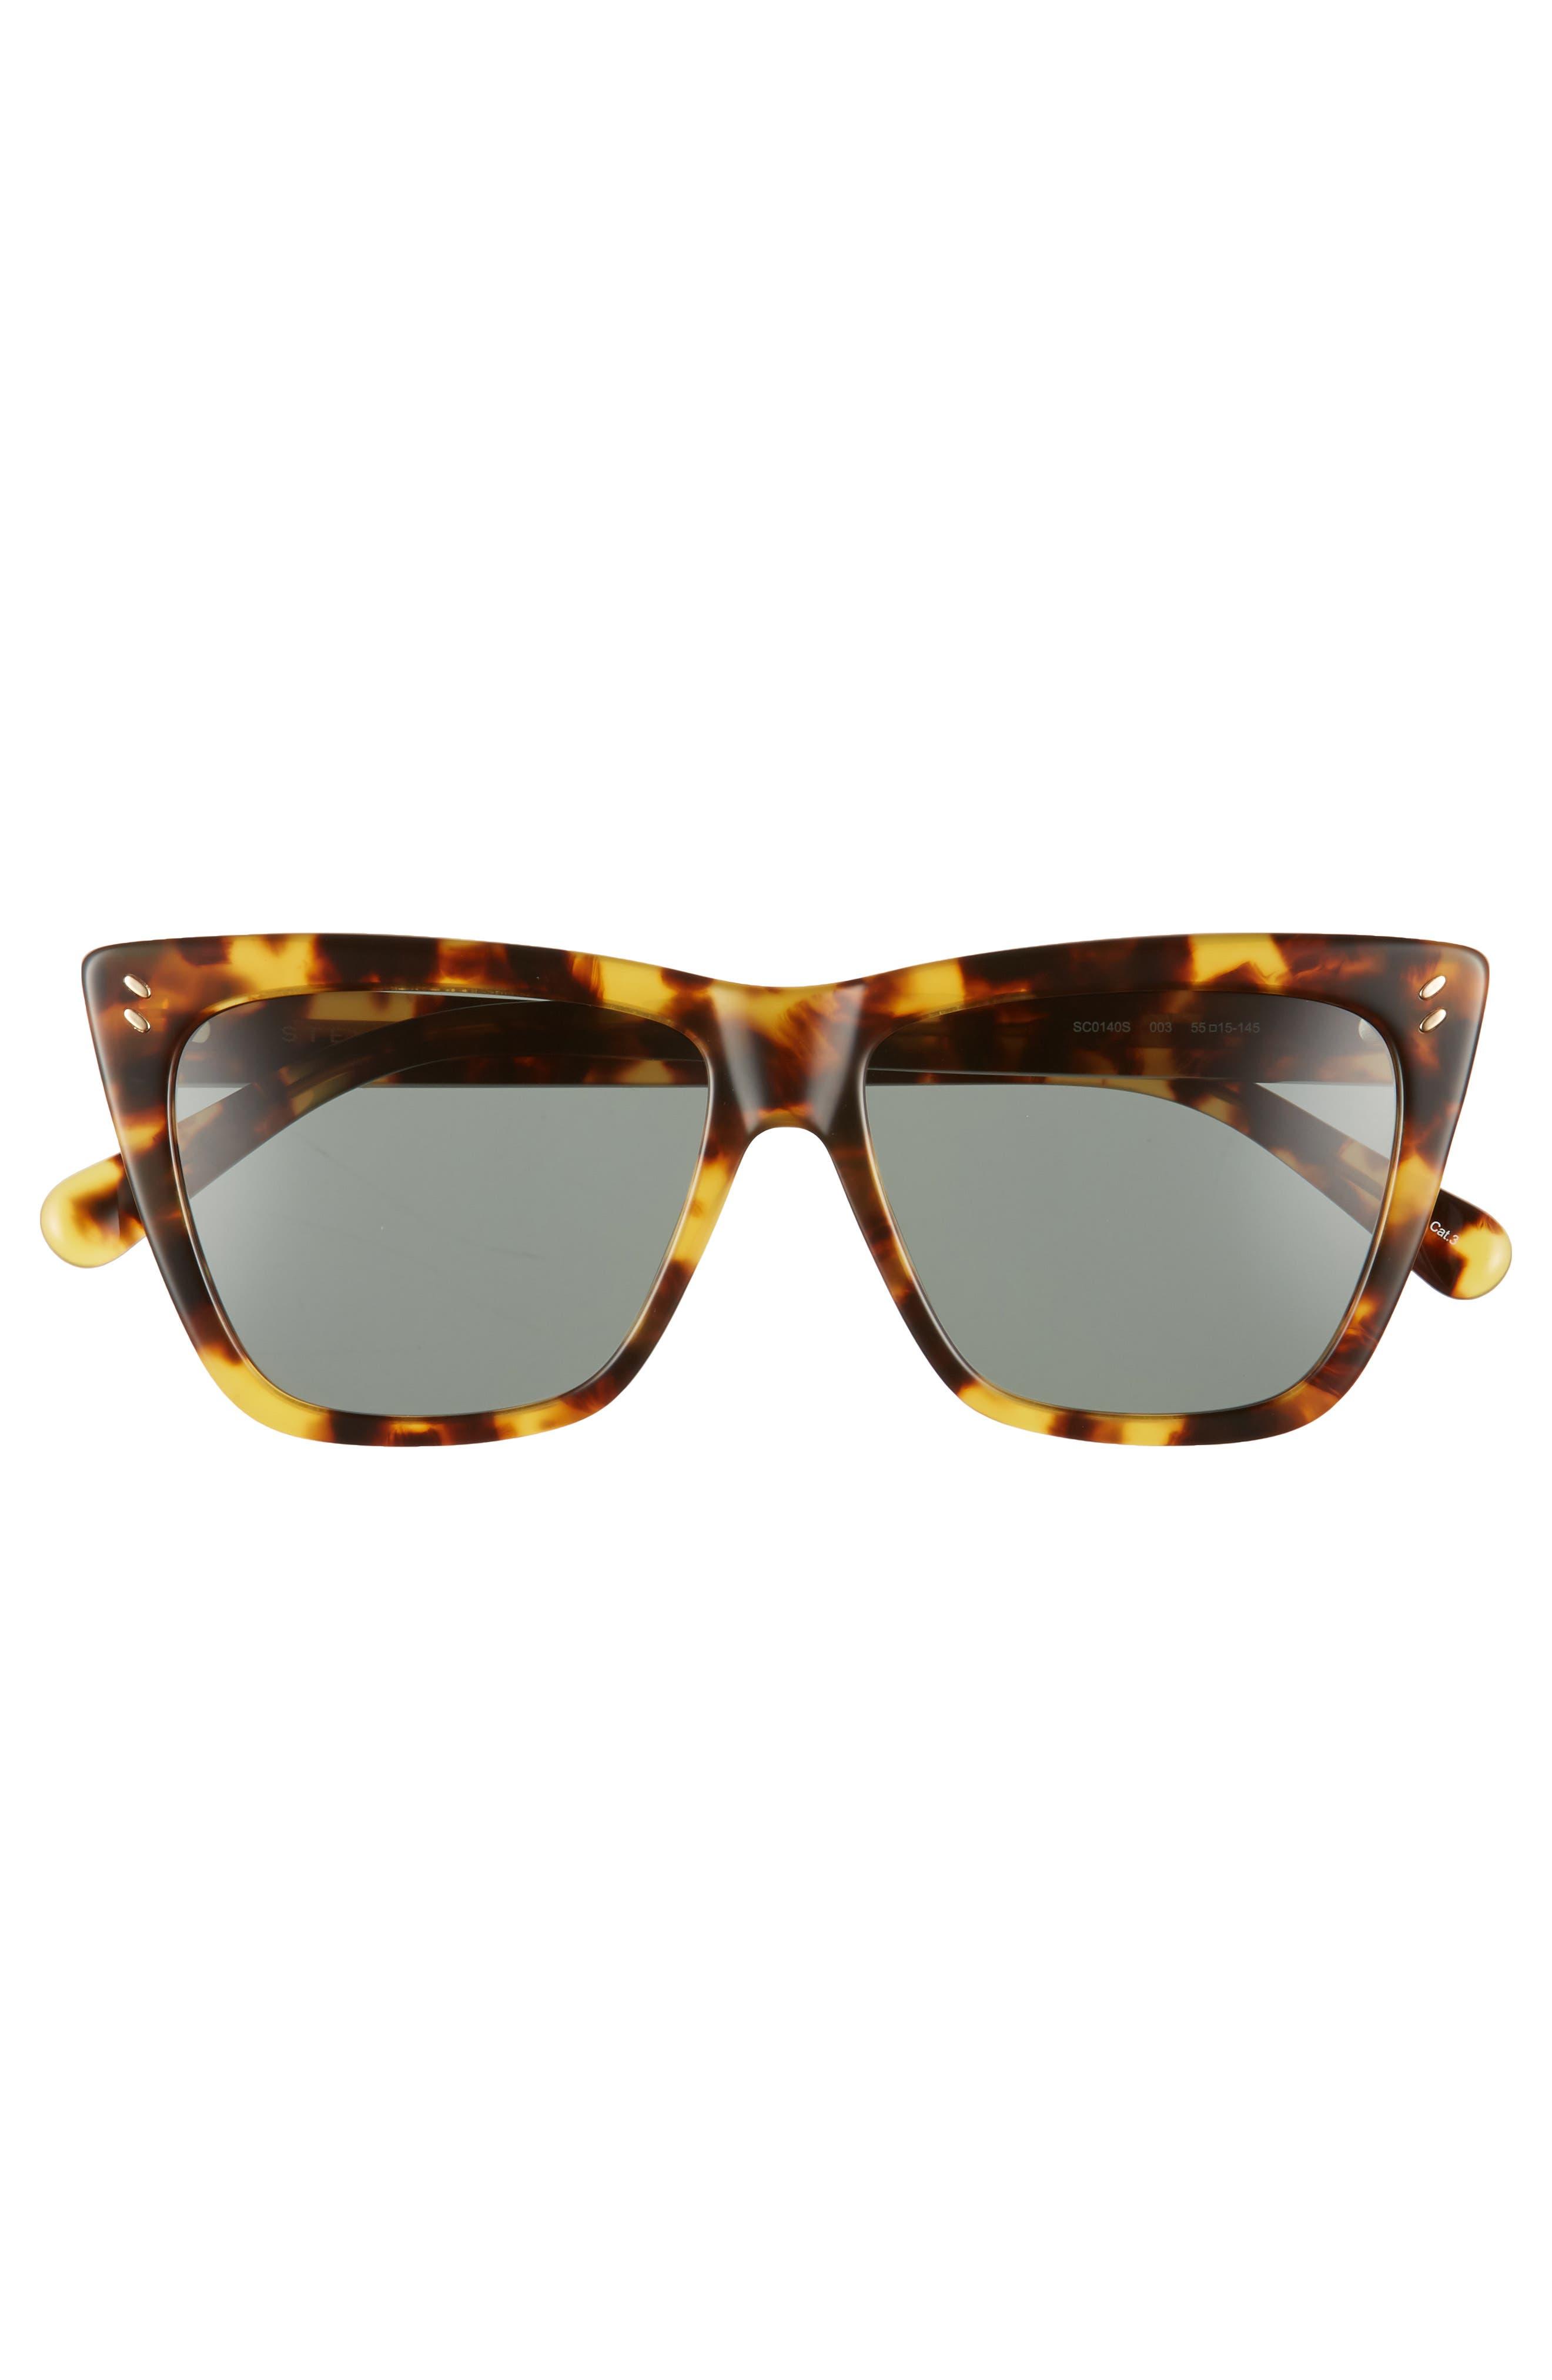 55mm Polarized Sunglasses,                             Alternate thumbnail 3, color,                             Medium Havana